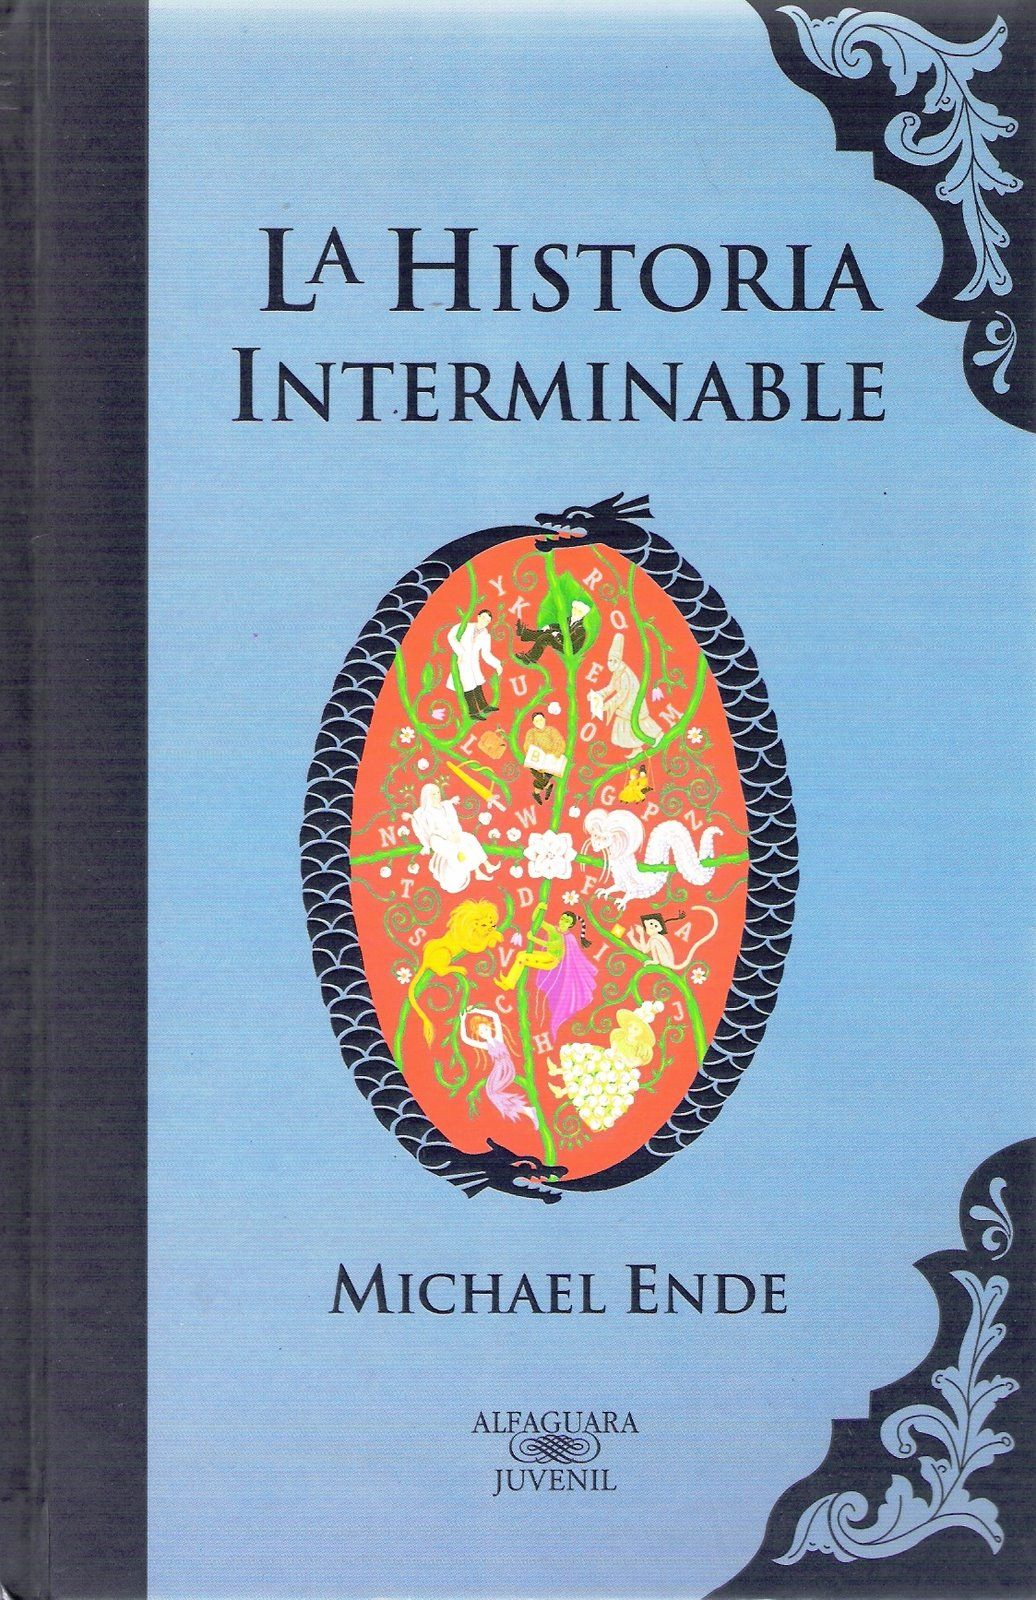 1979 Historia Interminable, Libros Para Niños, Libros Gratis, Libros  Ciencia, Libros Clásicos